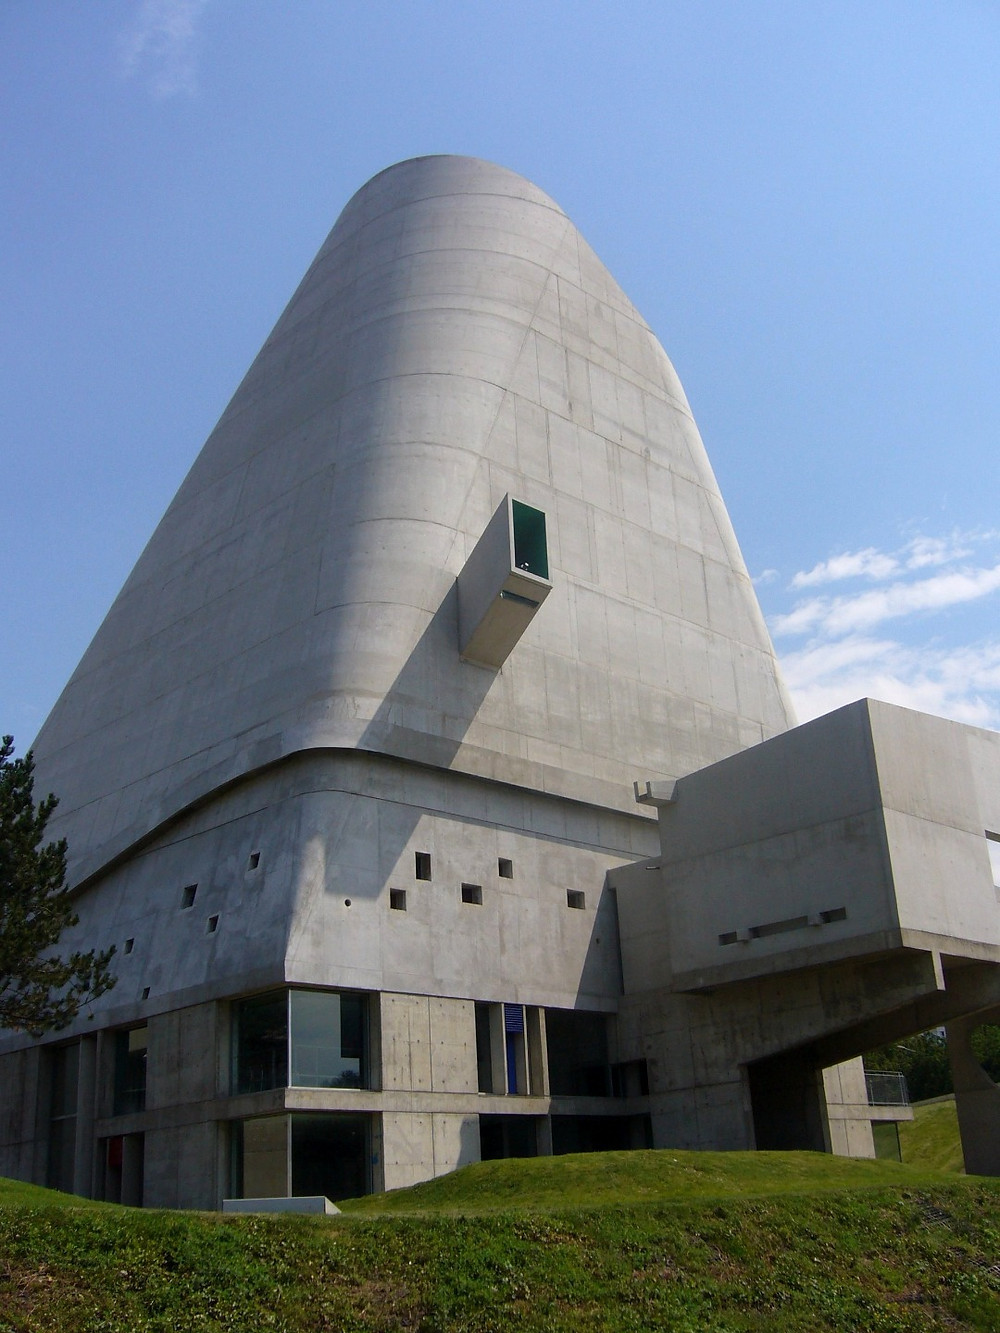 Eglise Saint Pierre Firminy